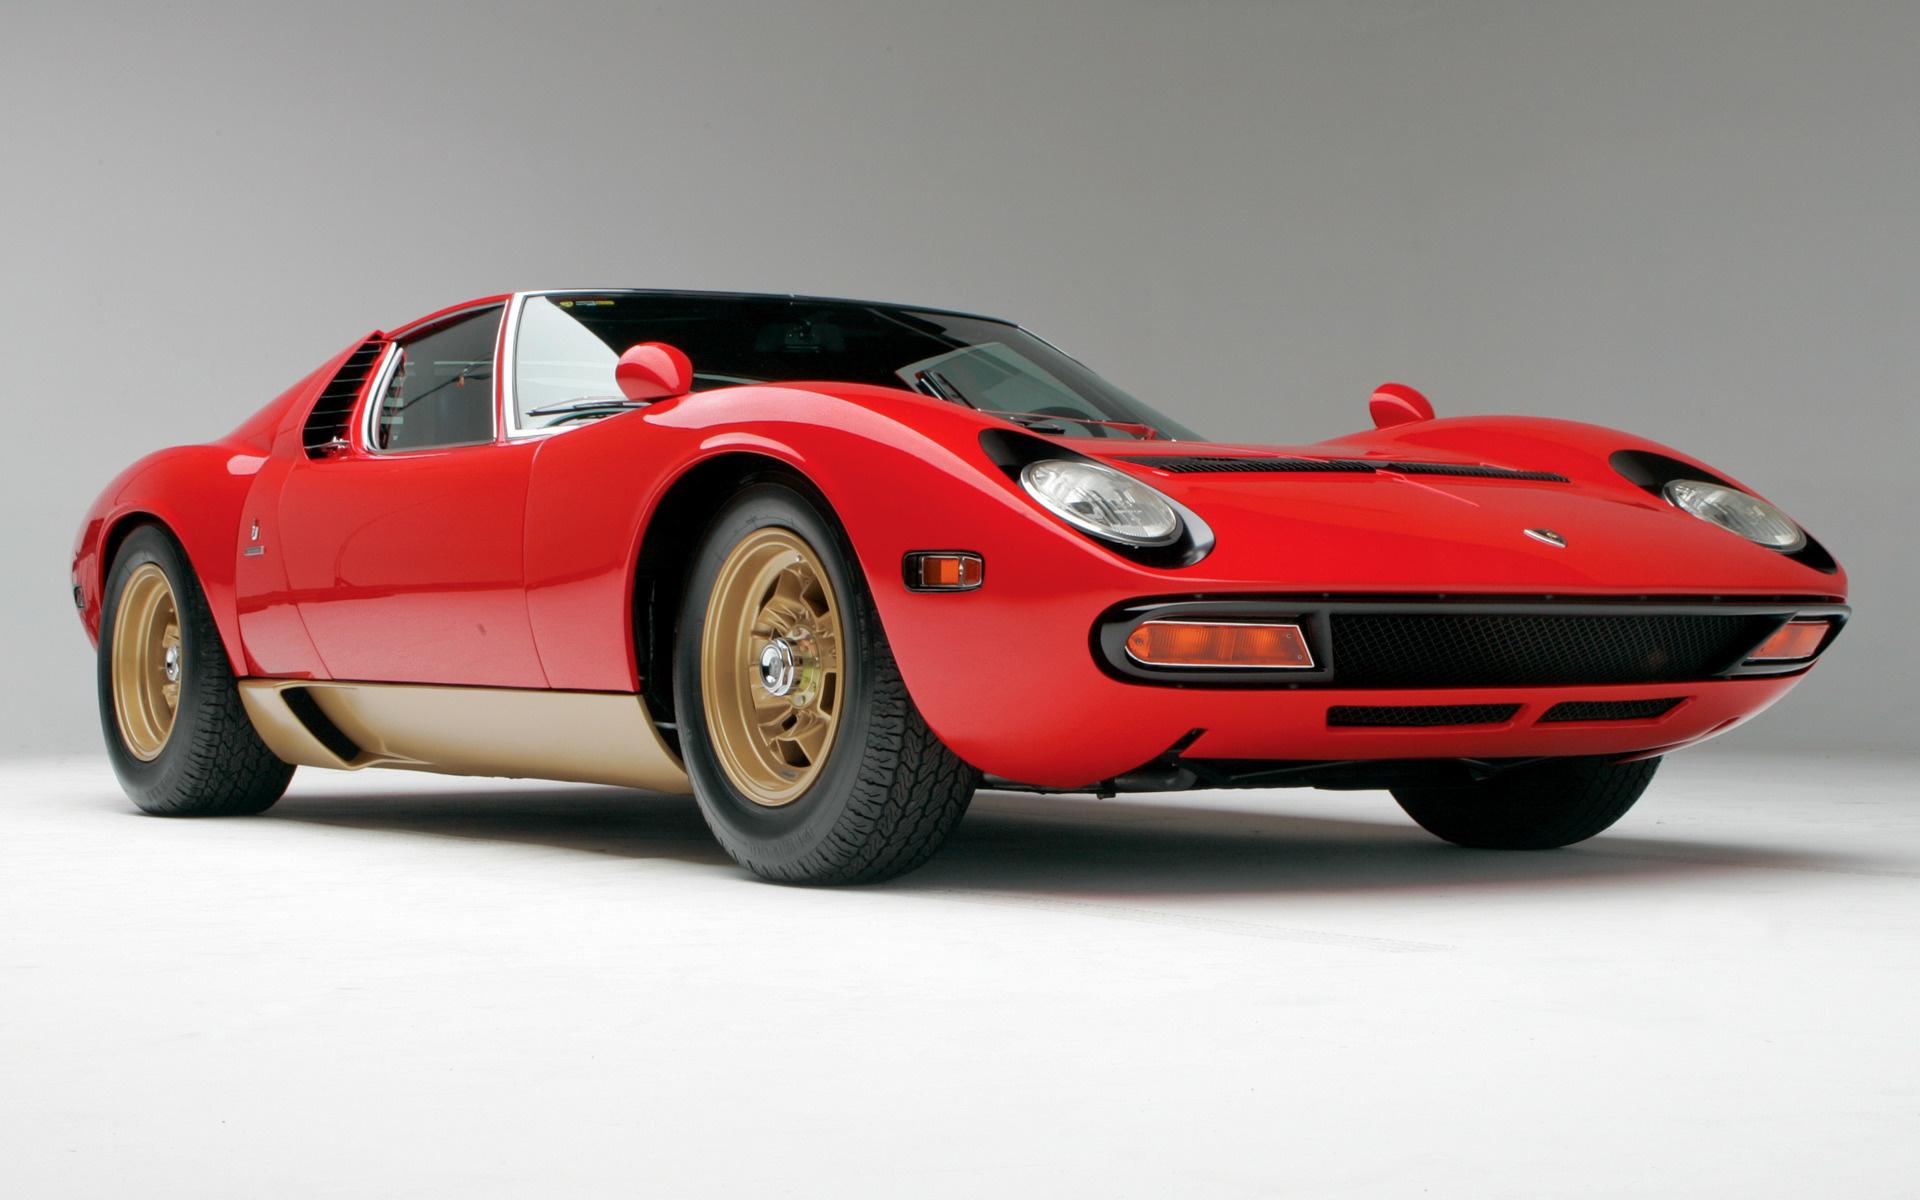 Lamborghini Miura SV (1971) US Wallpapers and HD Images ...